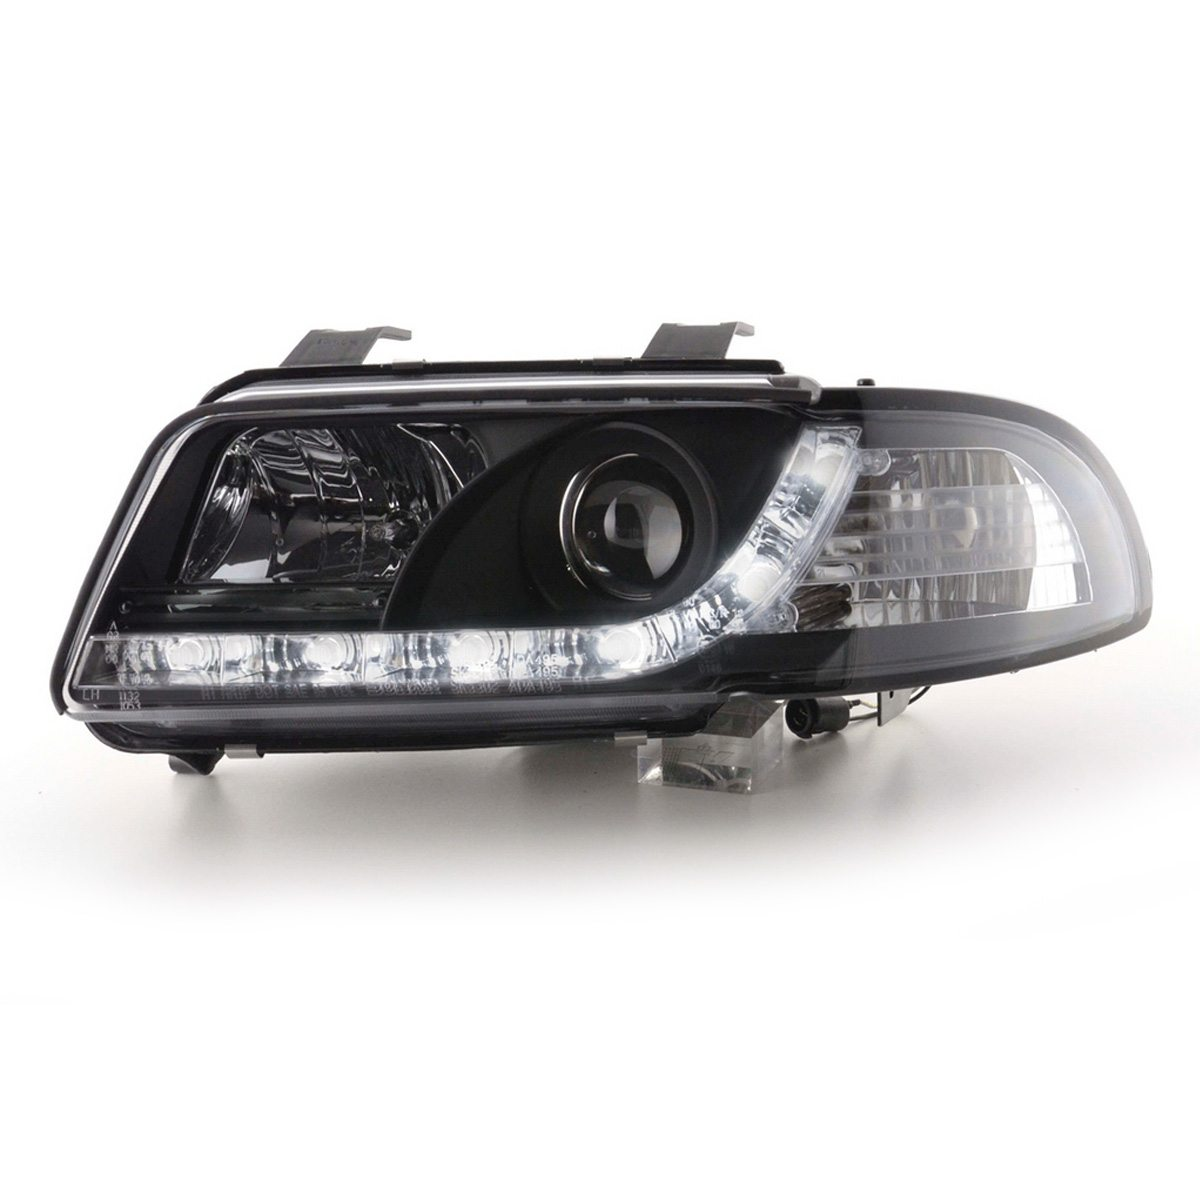 Audi-A4-B5-LimAvant-99-00-Faróis-Angel-Eyes-Dayline-Pretos-2